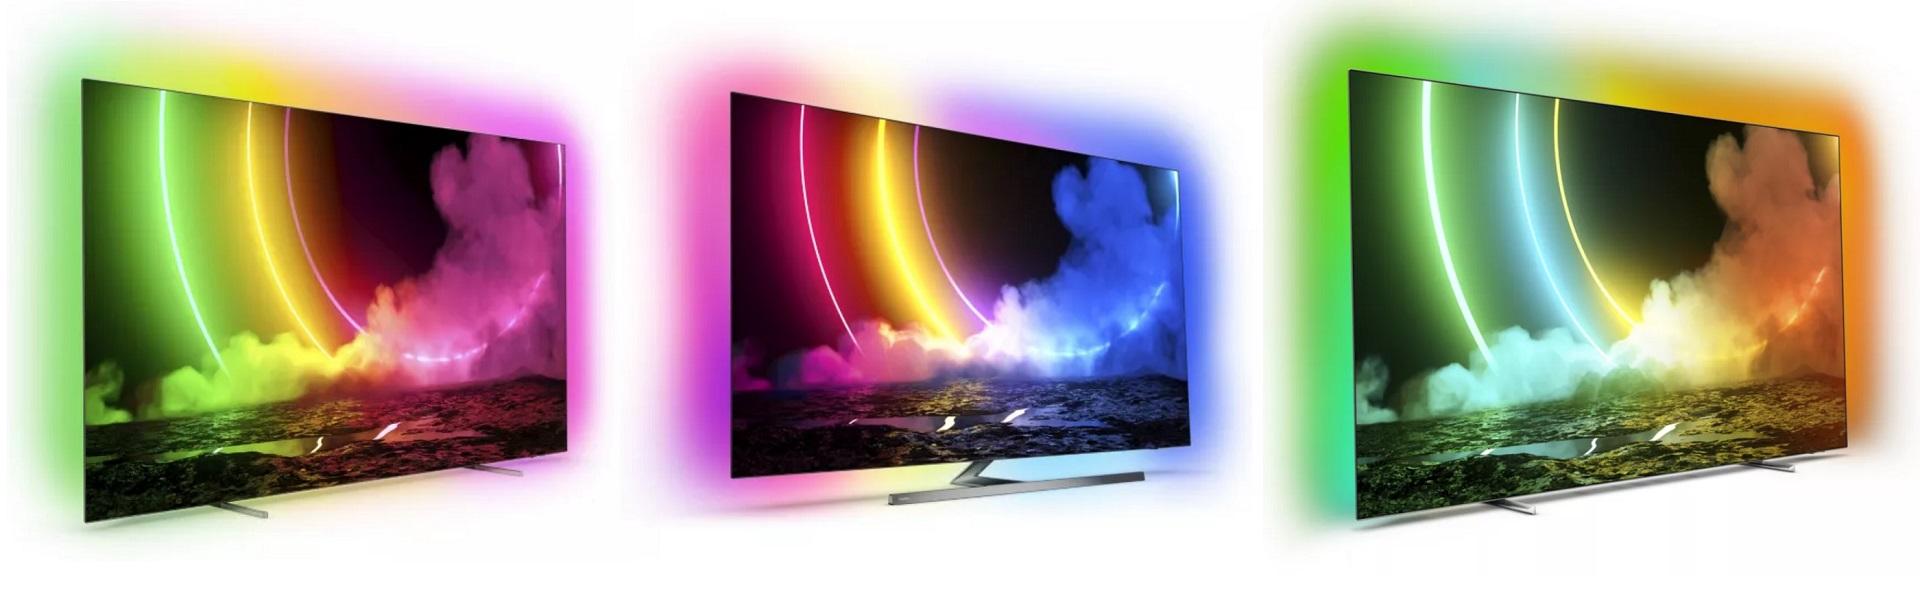 Philips-OLED806_OLED856_OLED706 TV-k